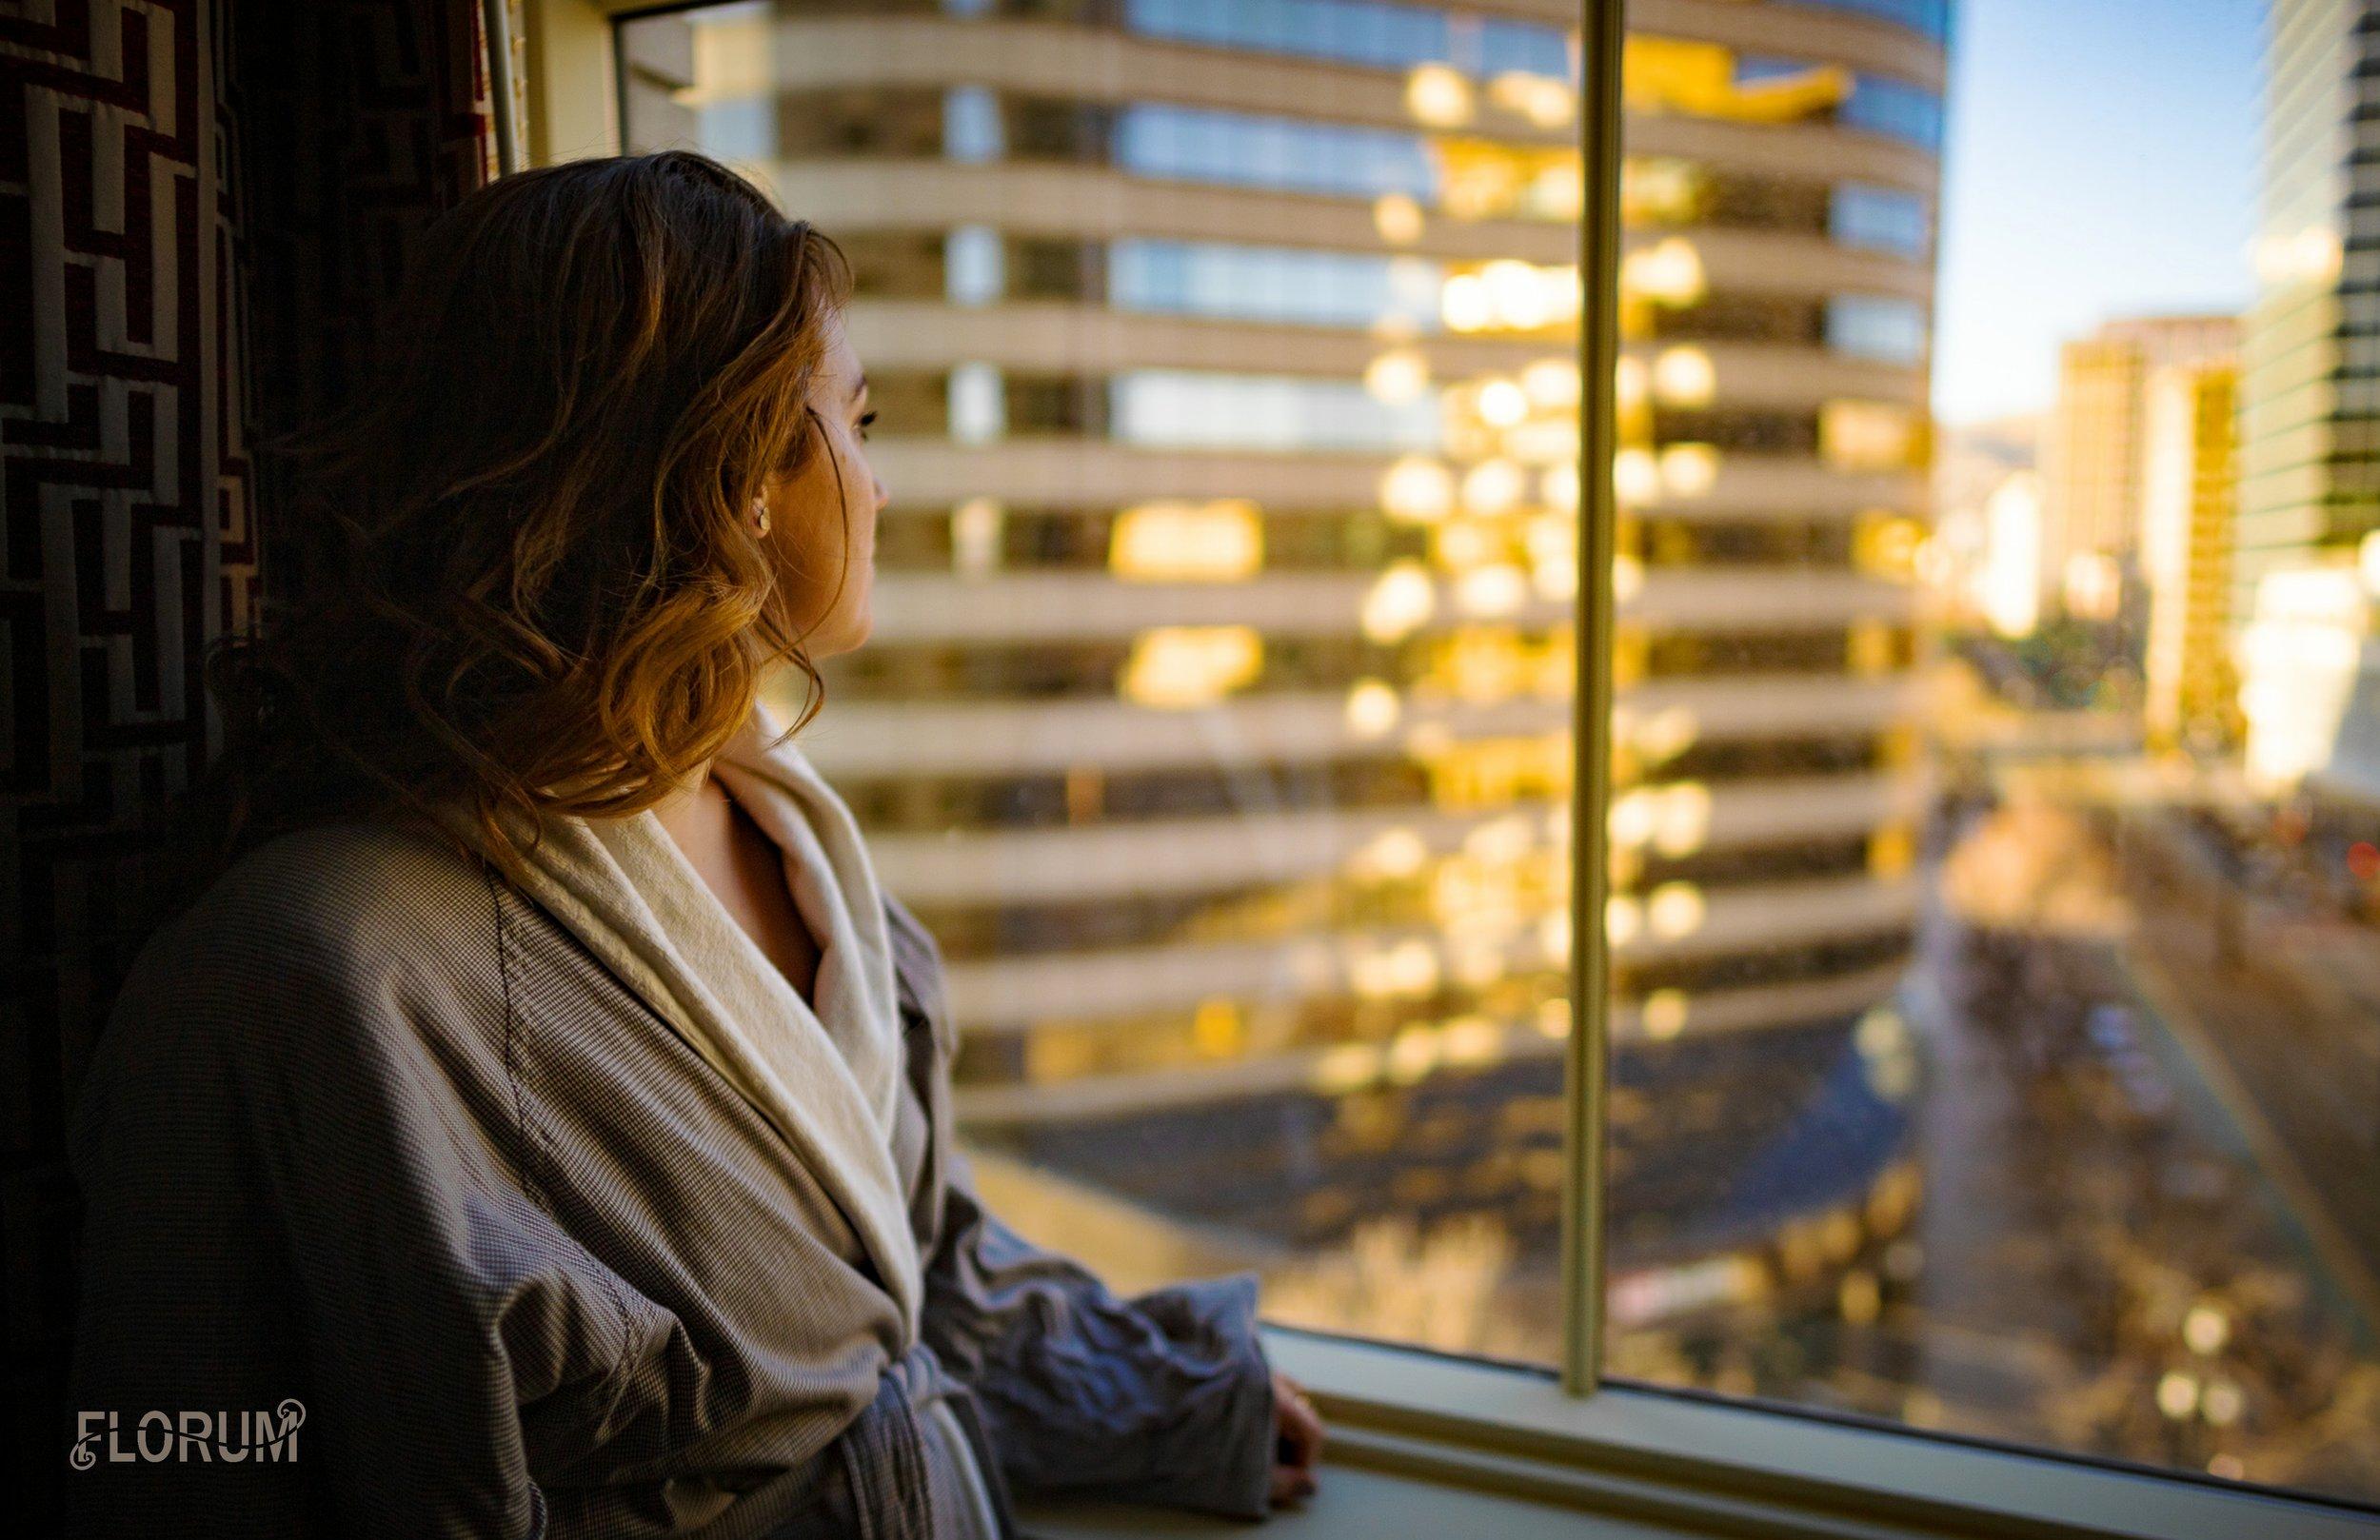 Salt Lake City - Hotel Monaco - Florum Fashion Magazine - Bobby Swingler - Ethical winter fashion - eco travel - noelle lynne16.jpg